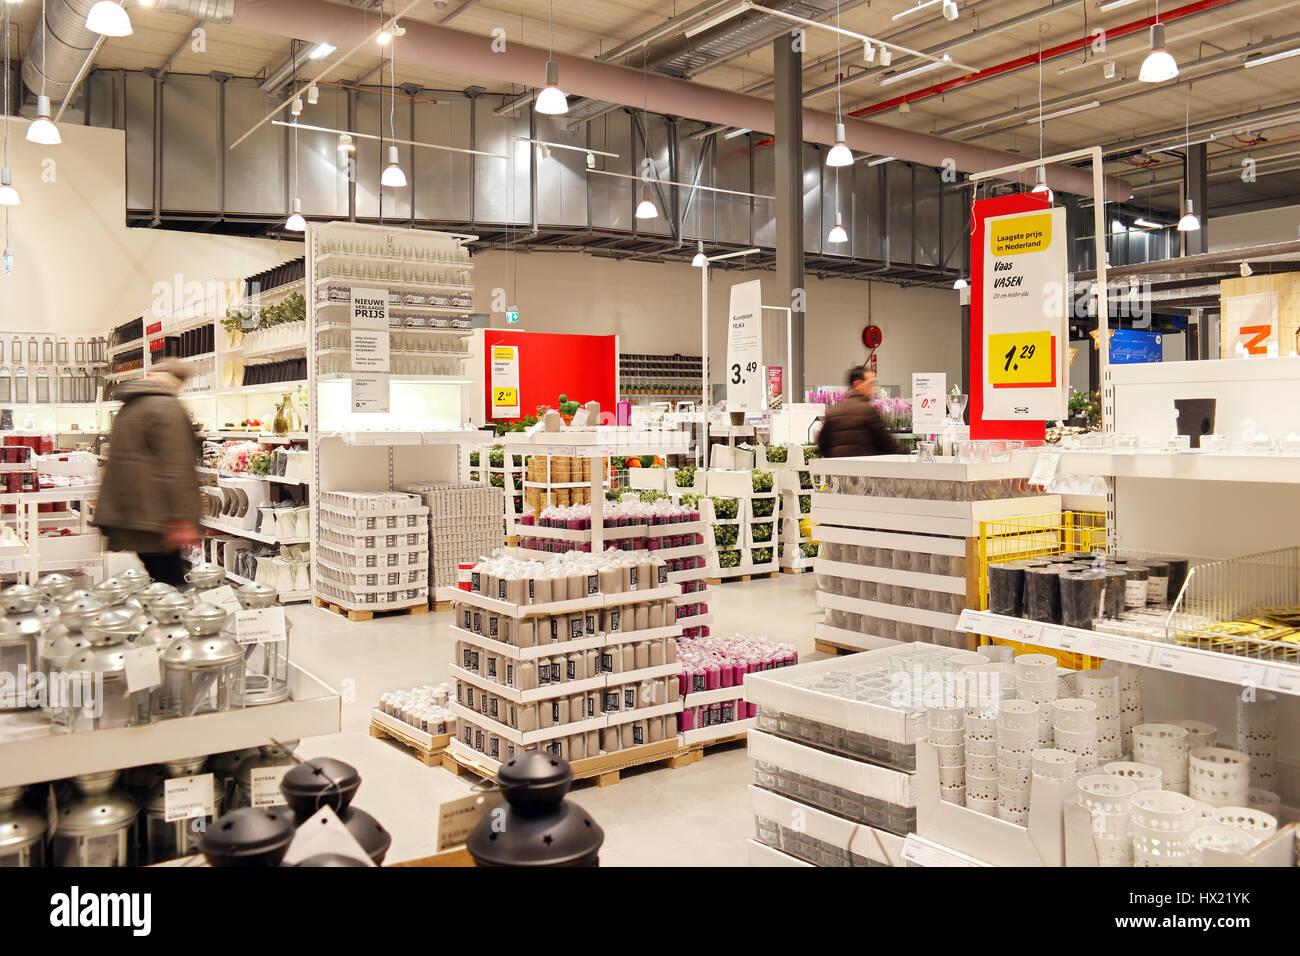 Warehouse area of Ikea furniture store - Stock Image